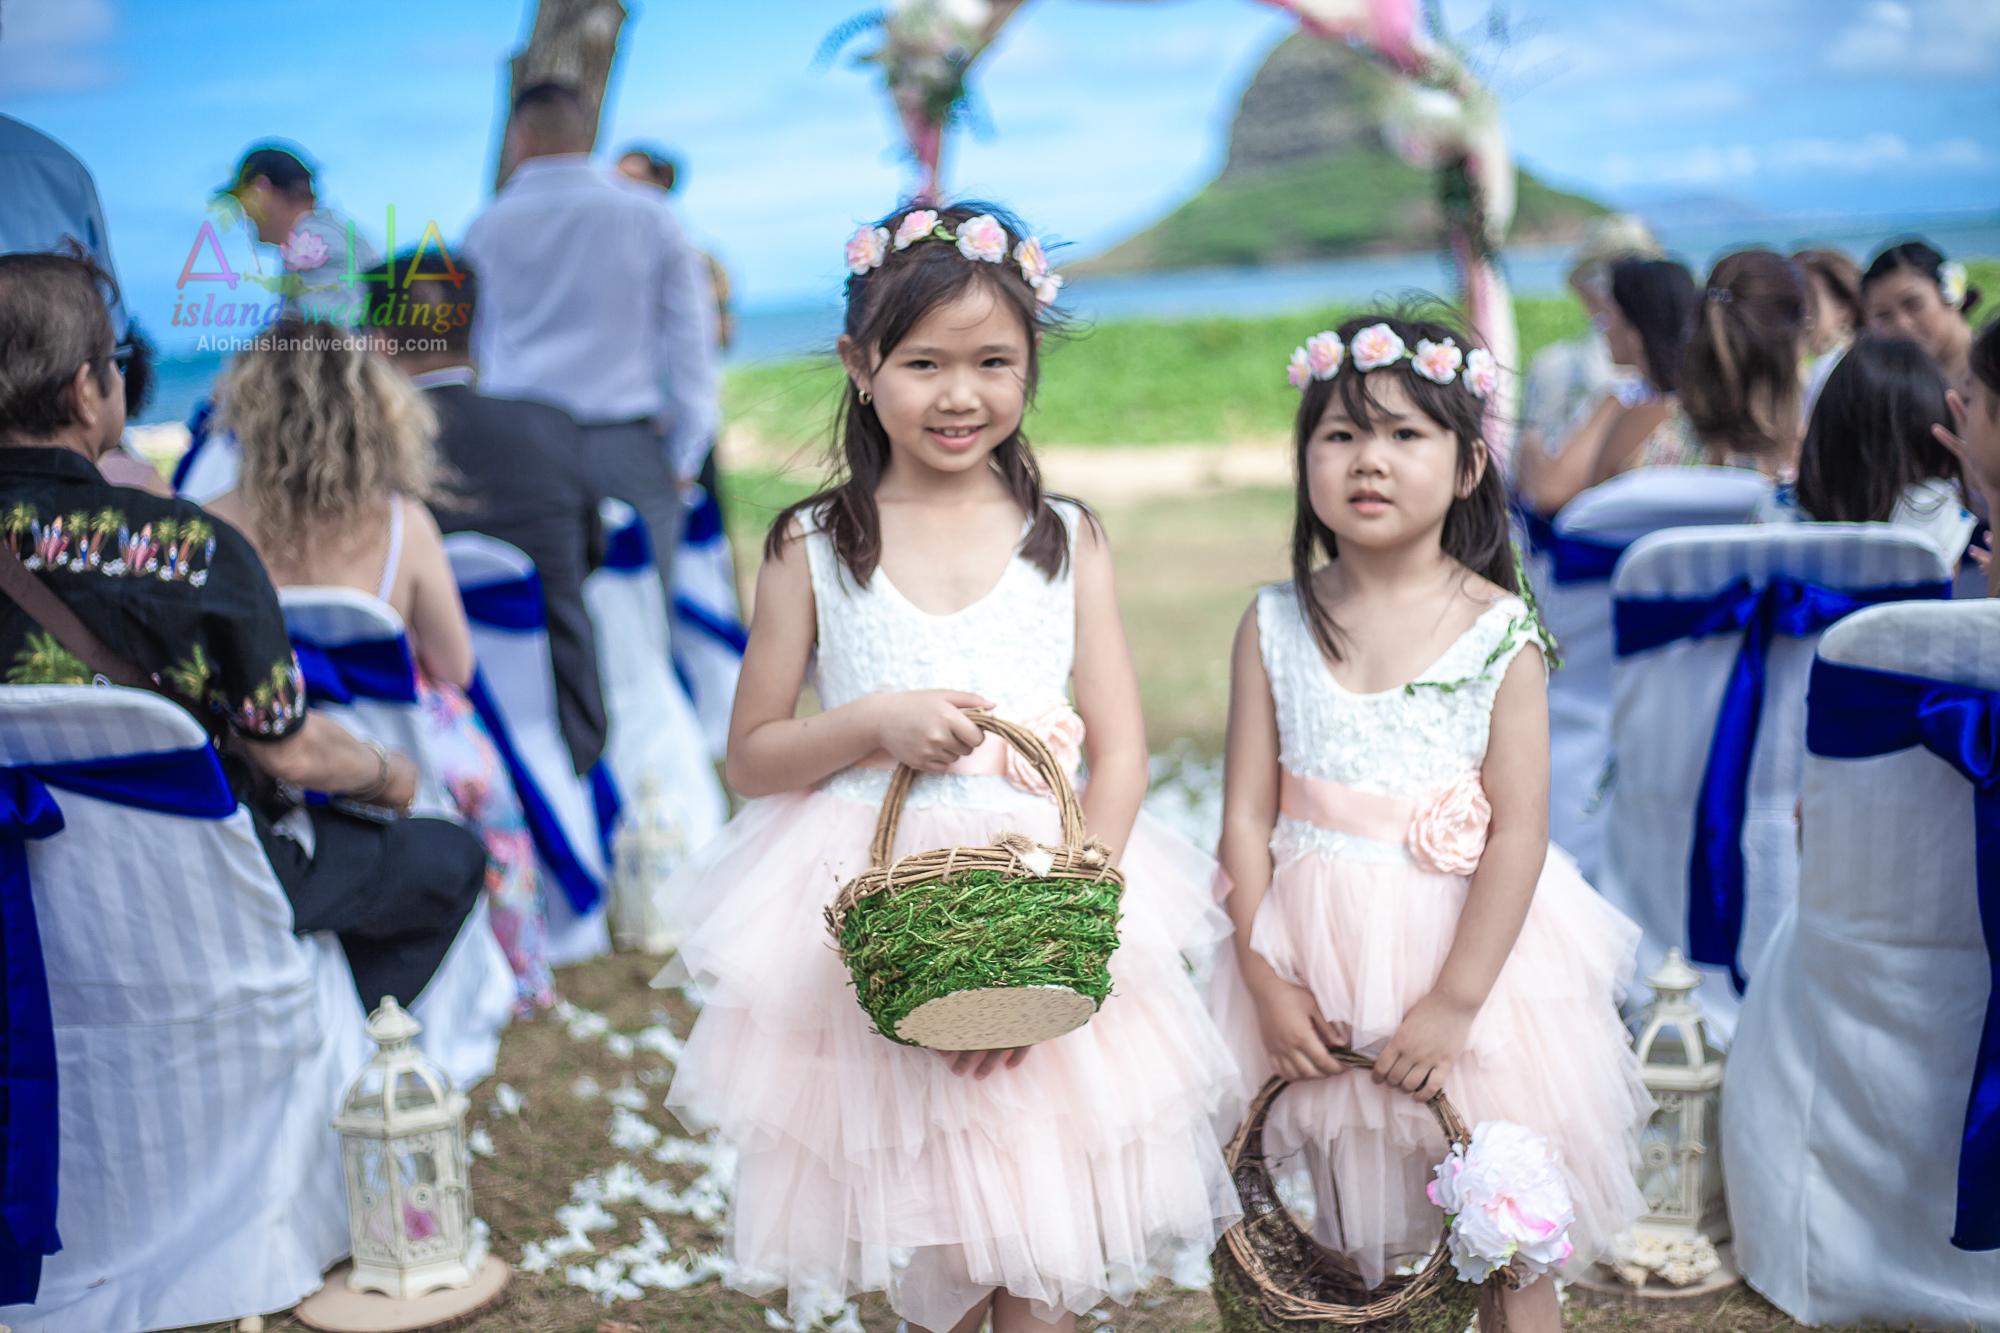 Hawaii weddings and events, Kualoa-30